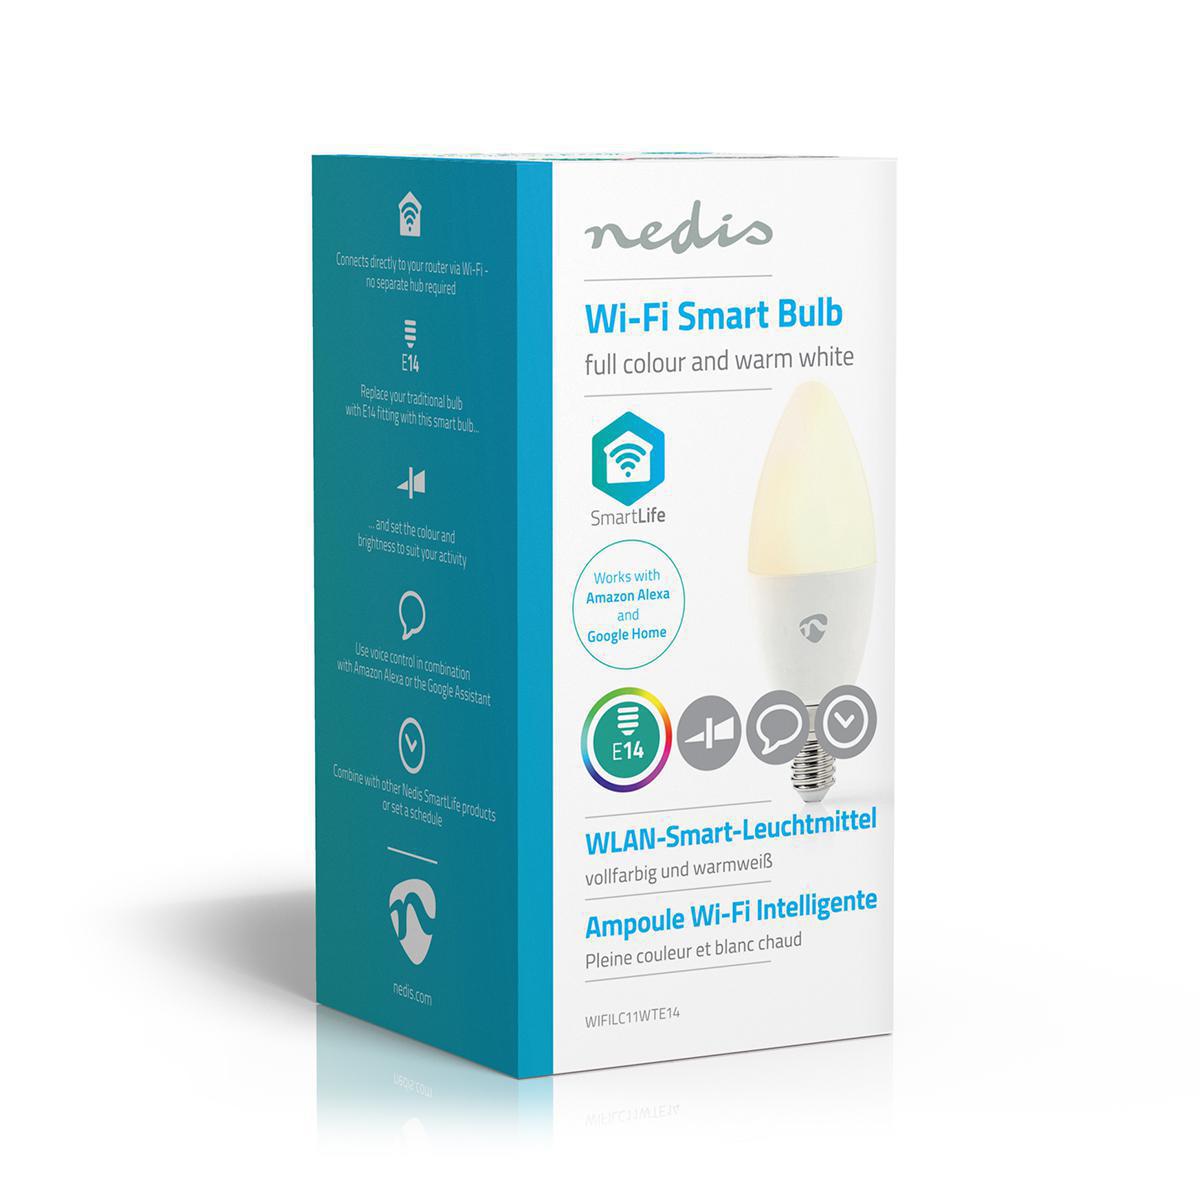 Slimme Led Lamp Wi-Fi - RGB en warm wit E14 - zijkant verpakking